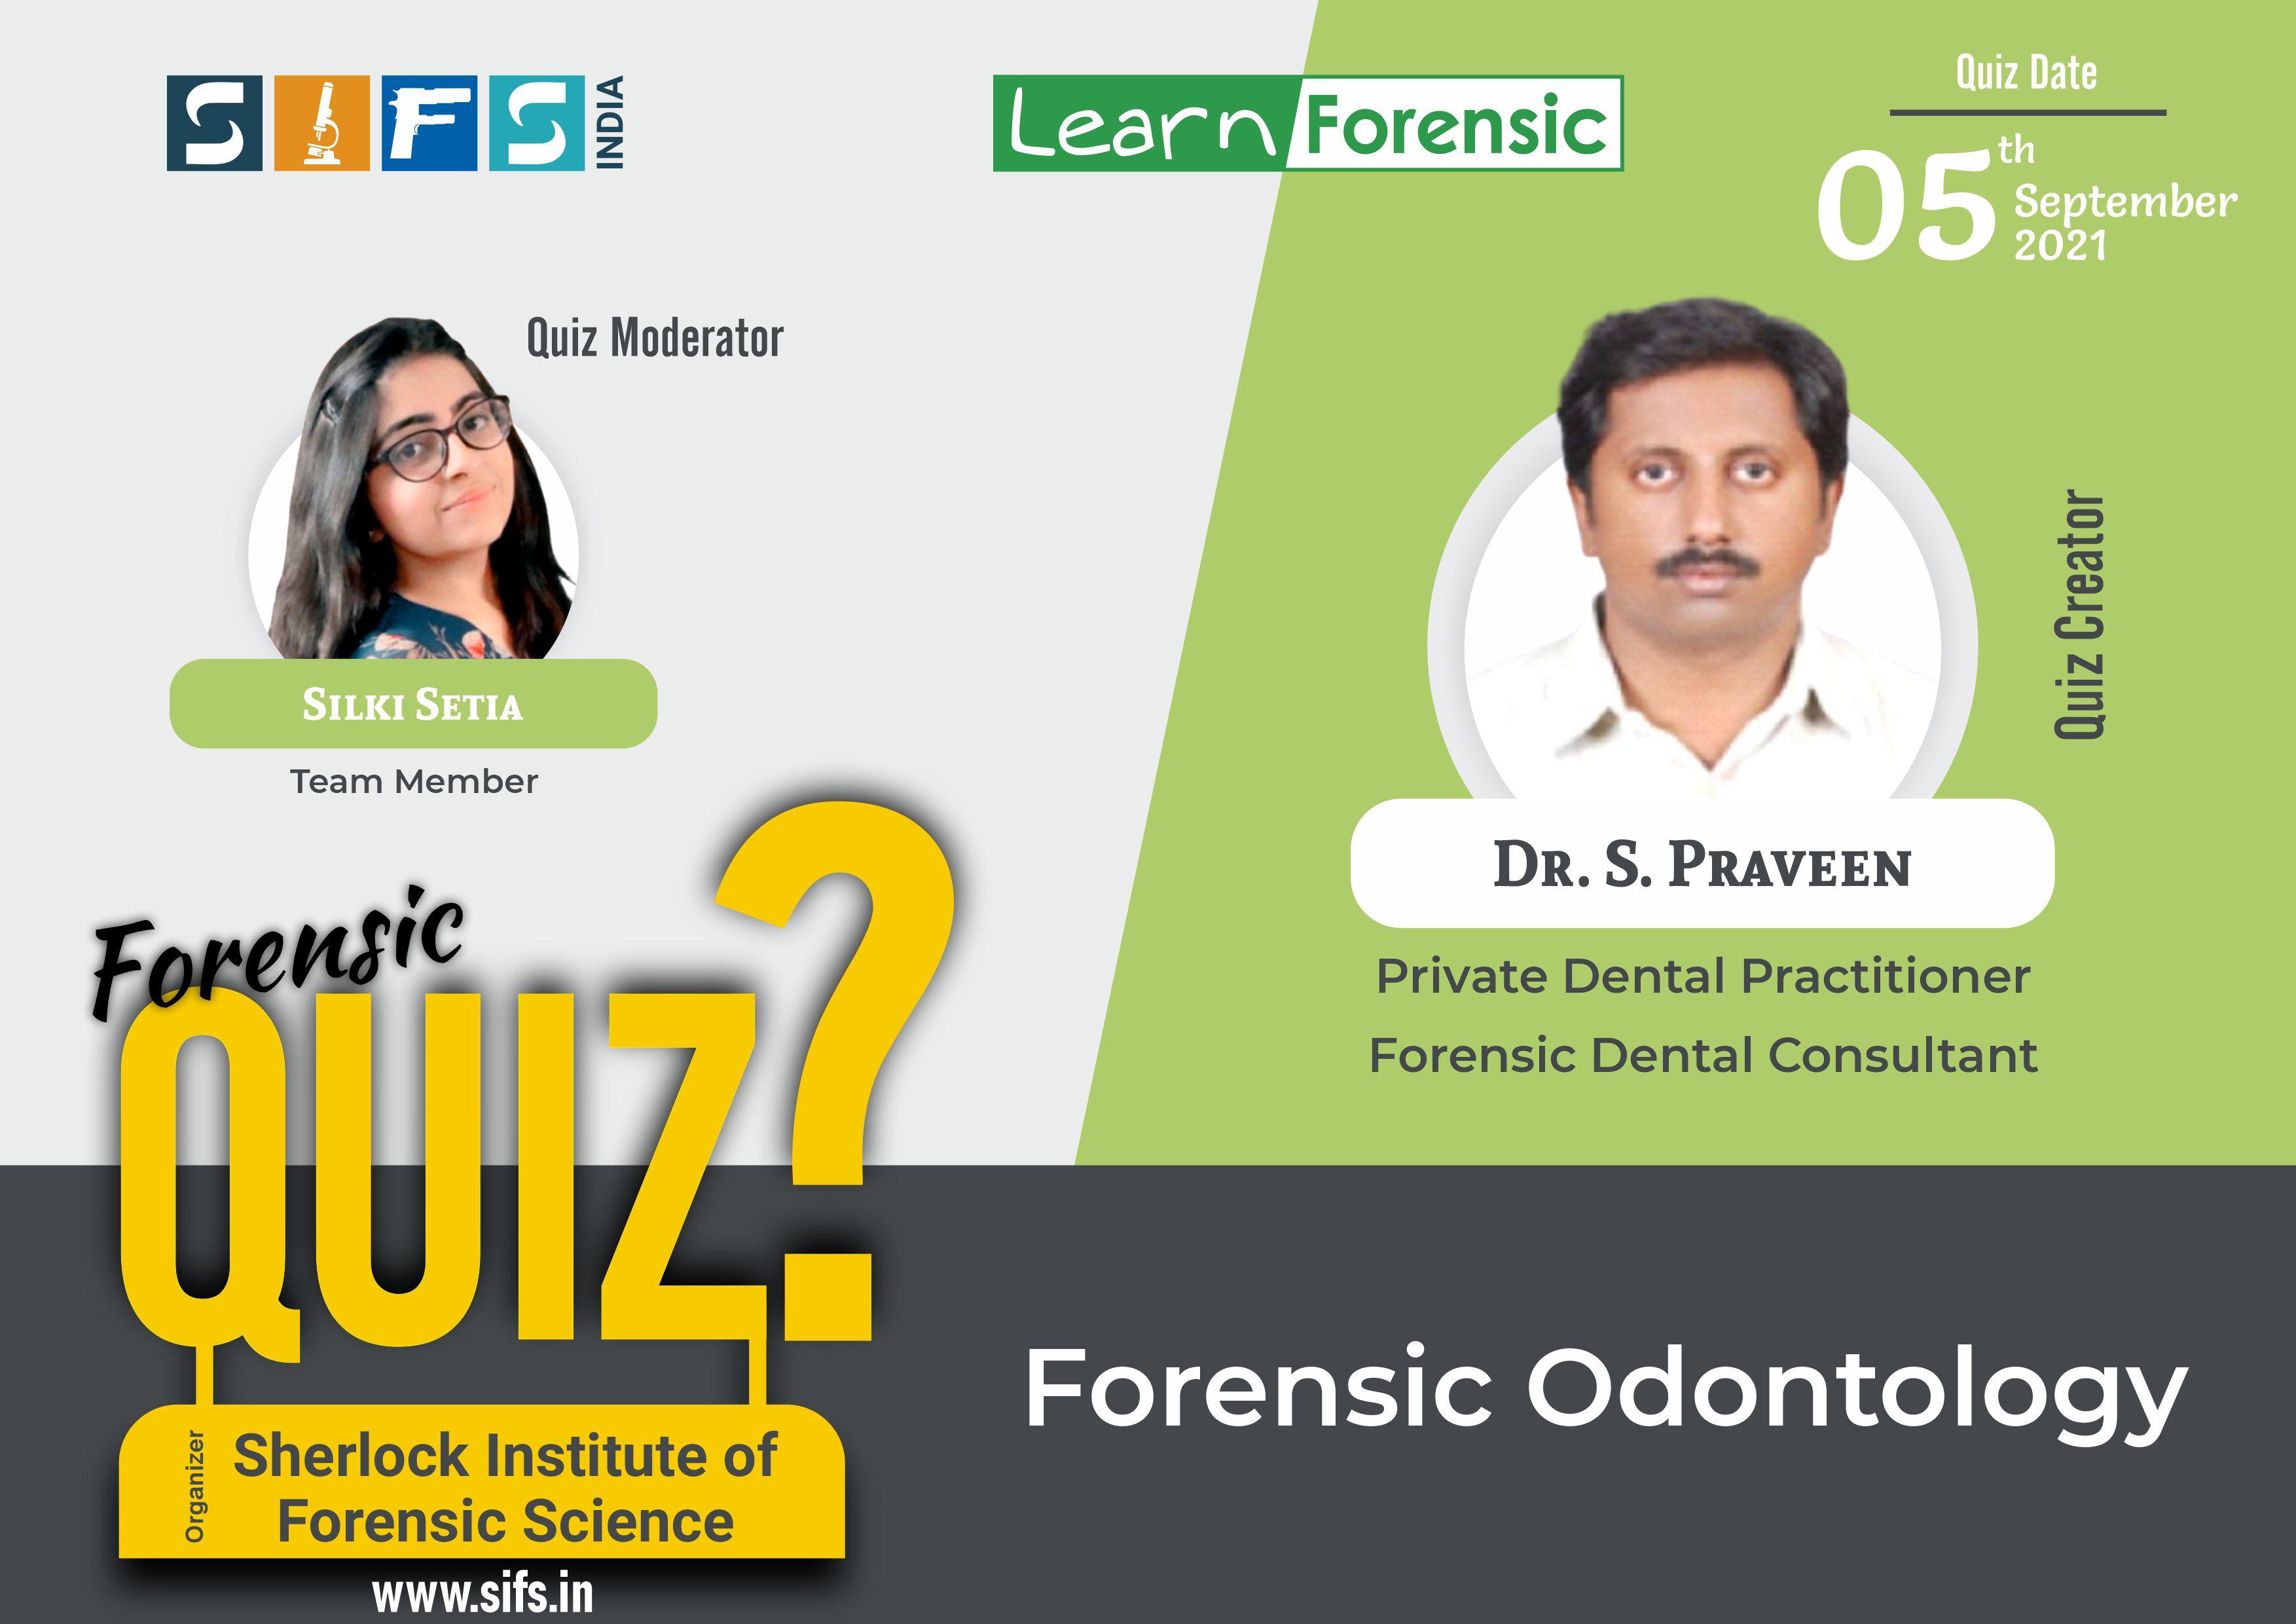 Forensic Odontology - Answers